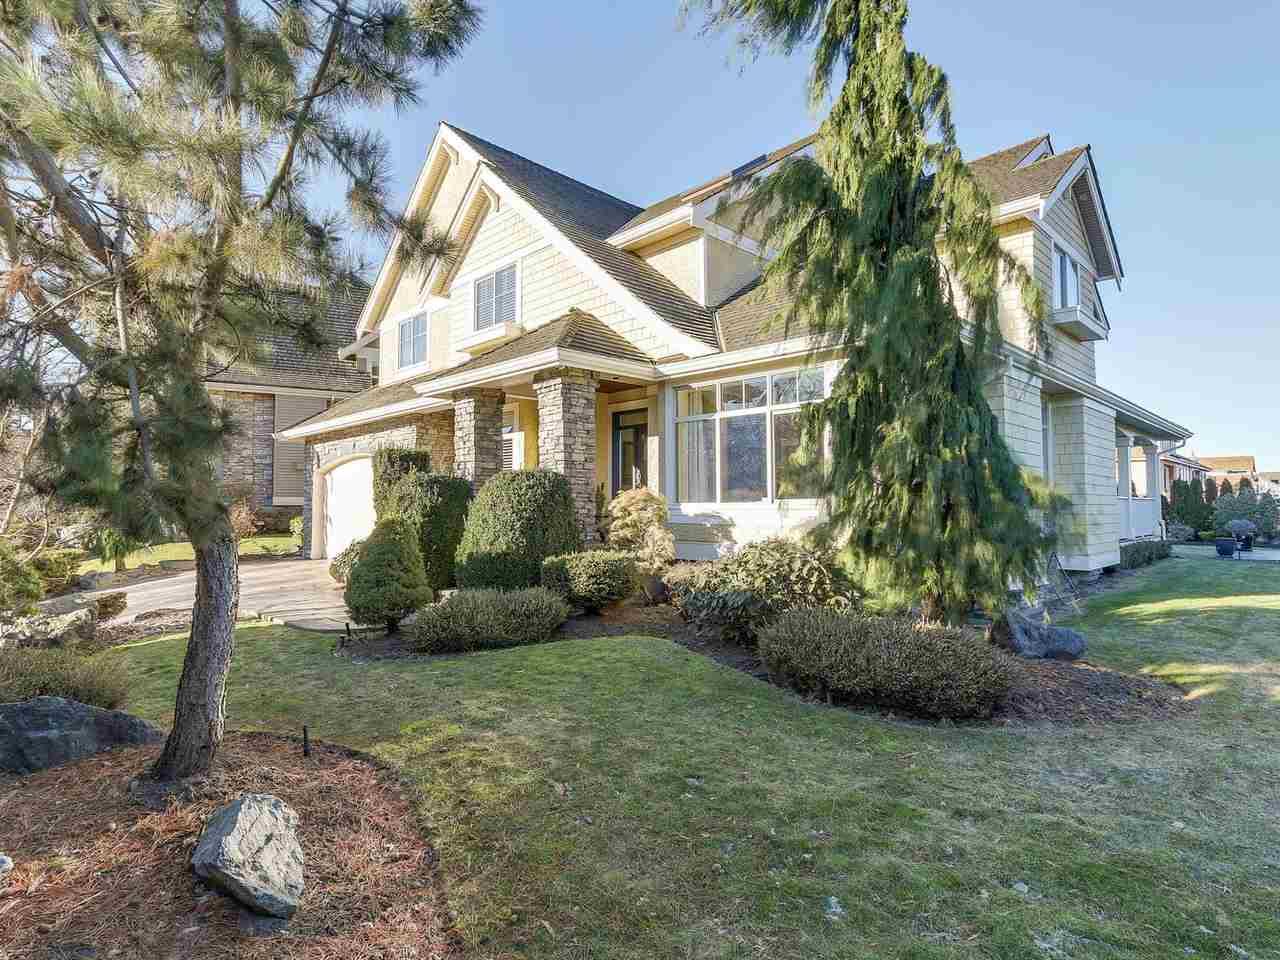 Sold: 15999 Devonshire Drive, Surrey, BC